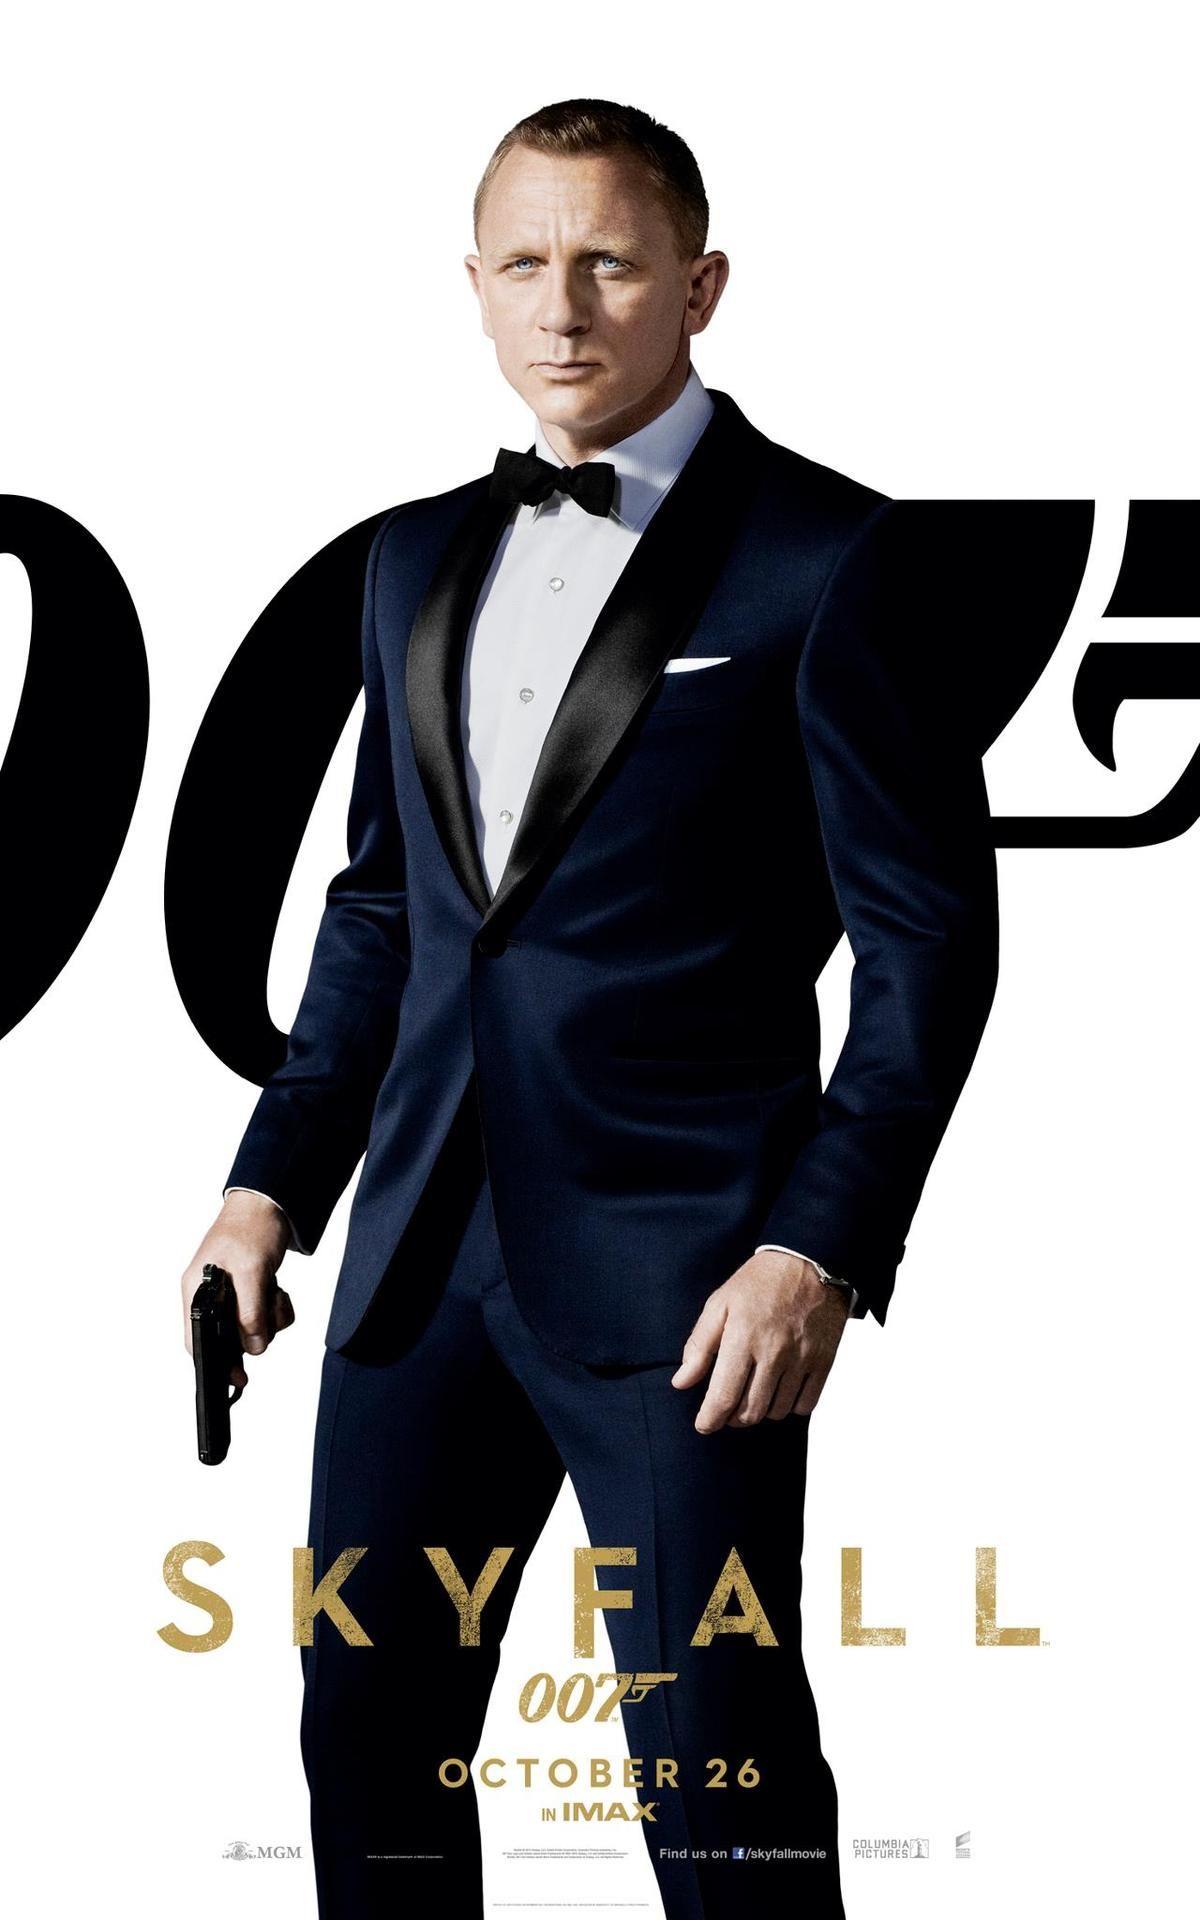 The Daniel Craig Fixation (UK SKYFALL cinema posters) | Daniel ...